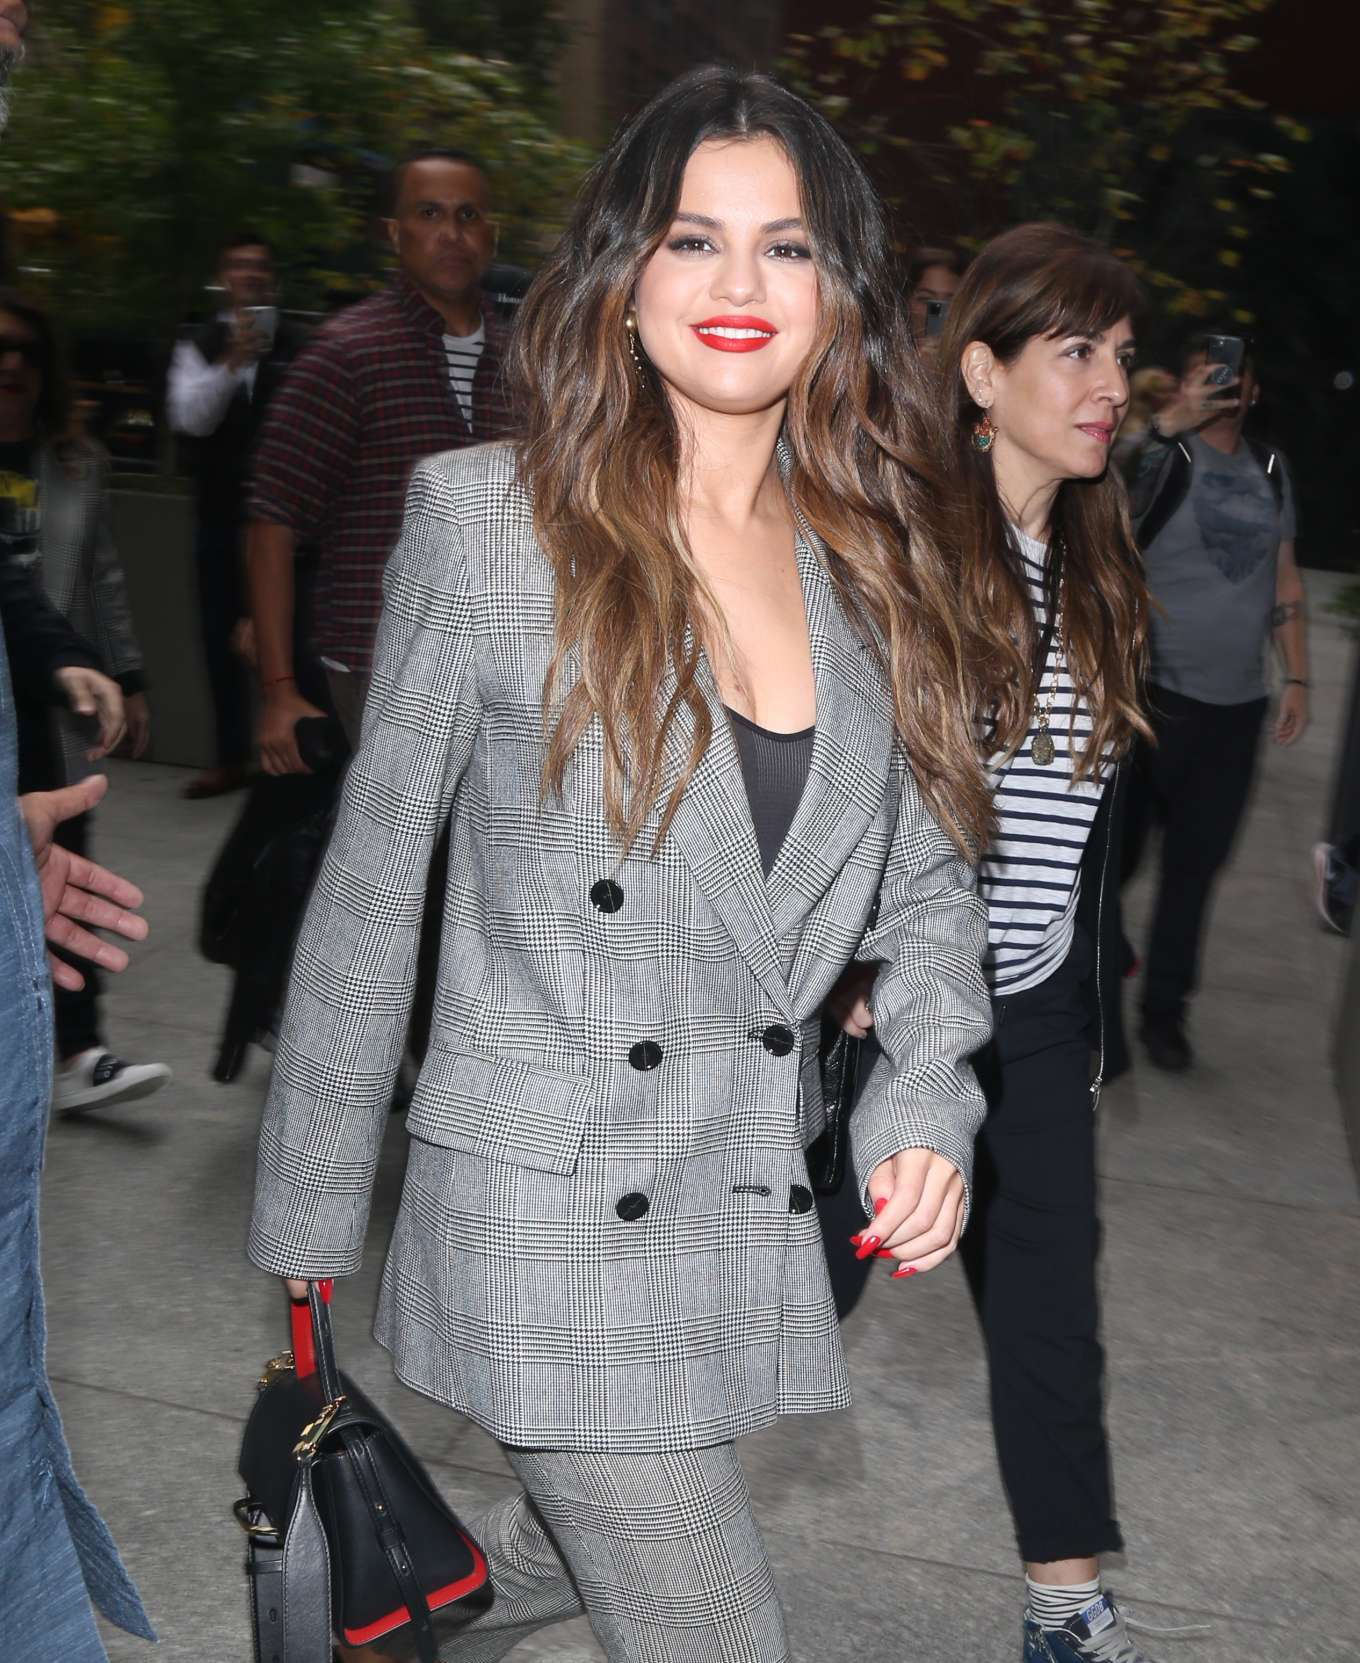 Selena Gomez - Arrives to her Midtown hotel in New York